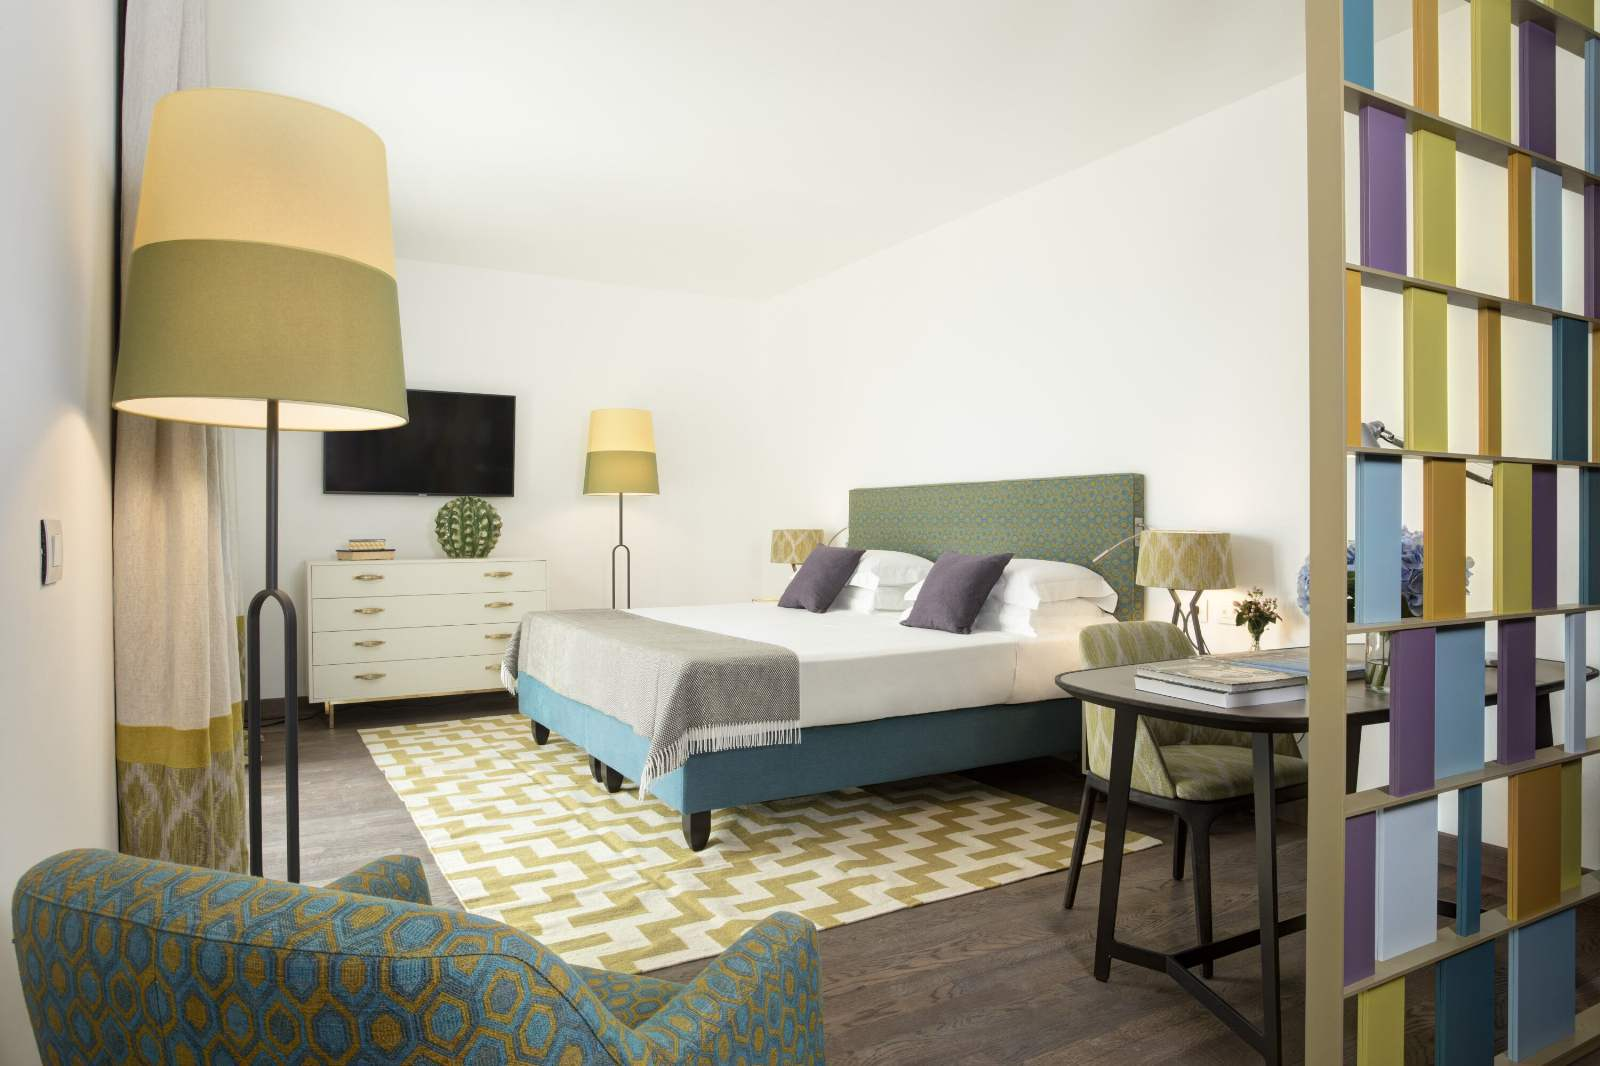 Verdura Resort: Private Villas: room / property / locale photo. Image 9